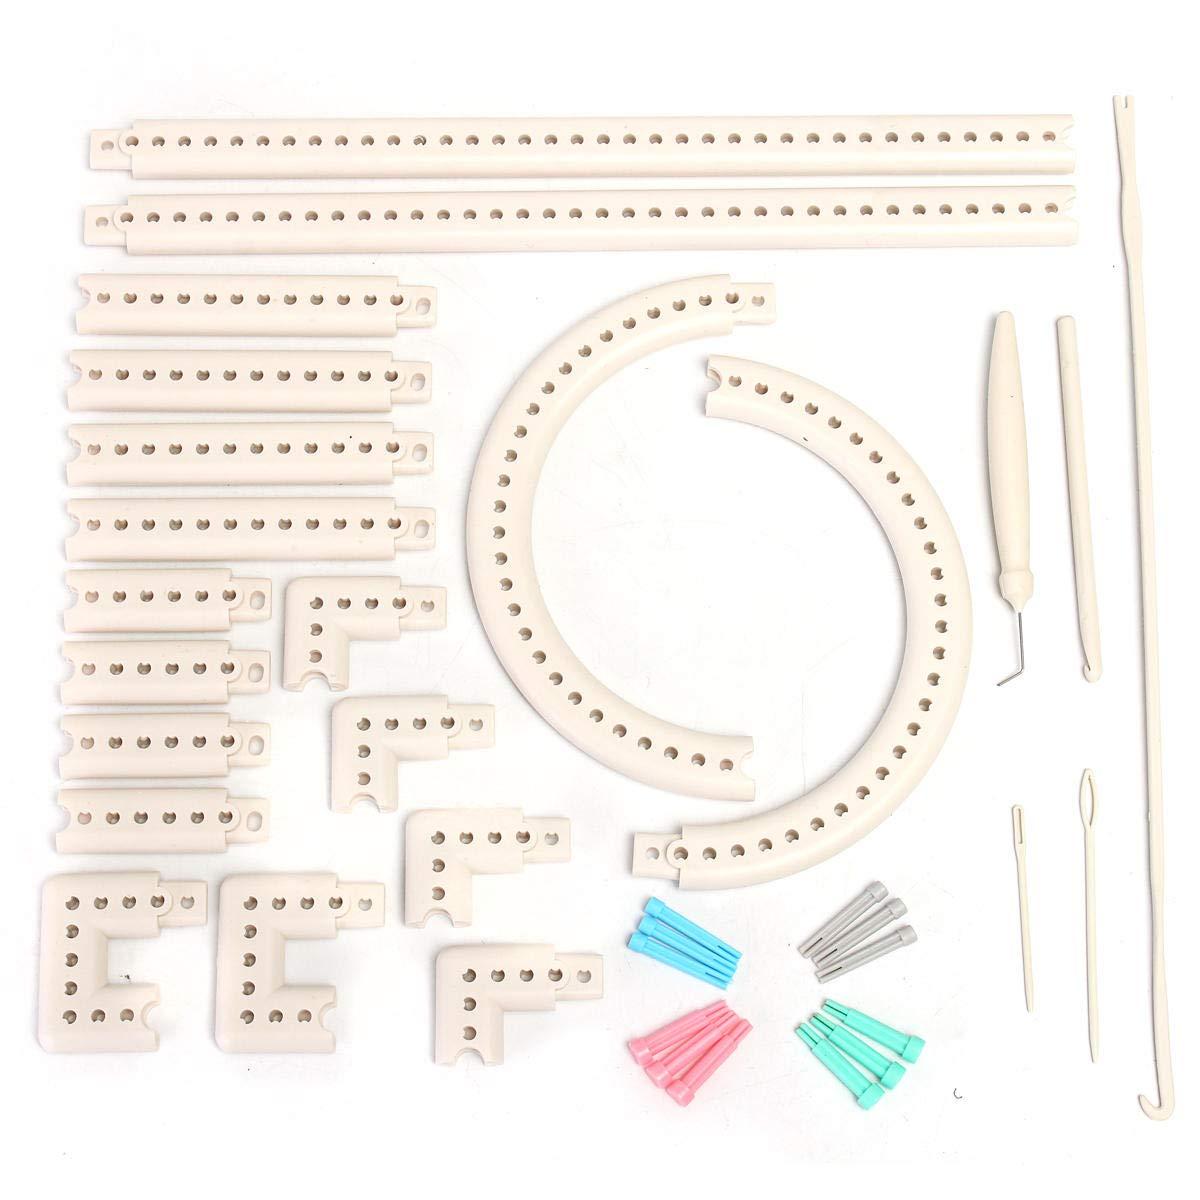 Craft Yarn Multi-function Knitting Board Knit & Weave Loom Kit DIY Tool Set